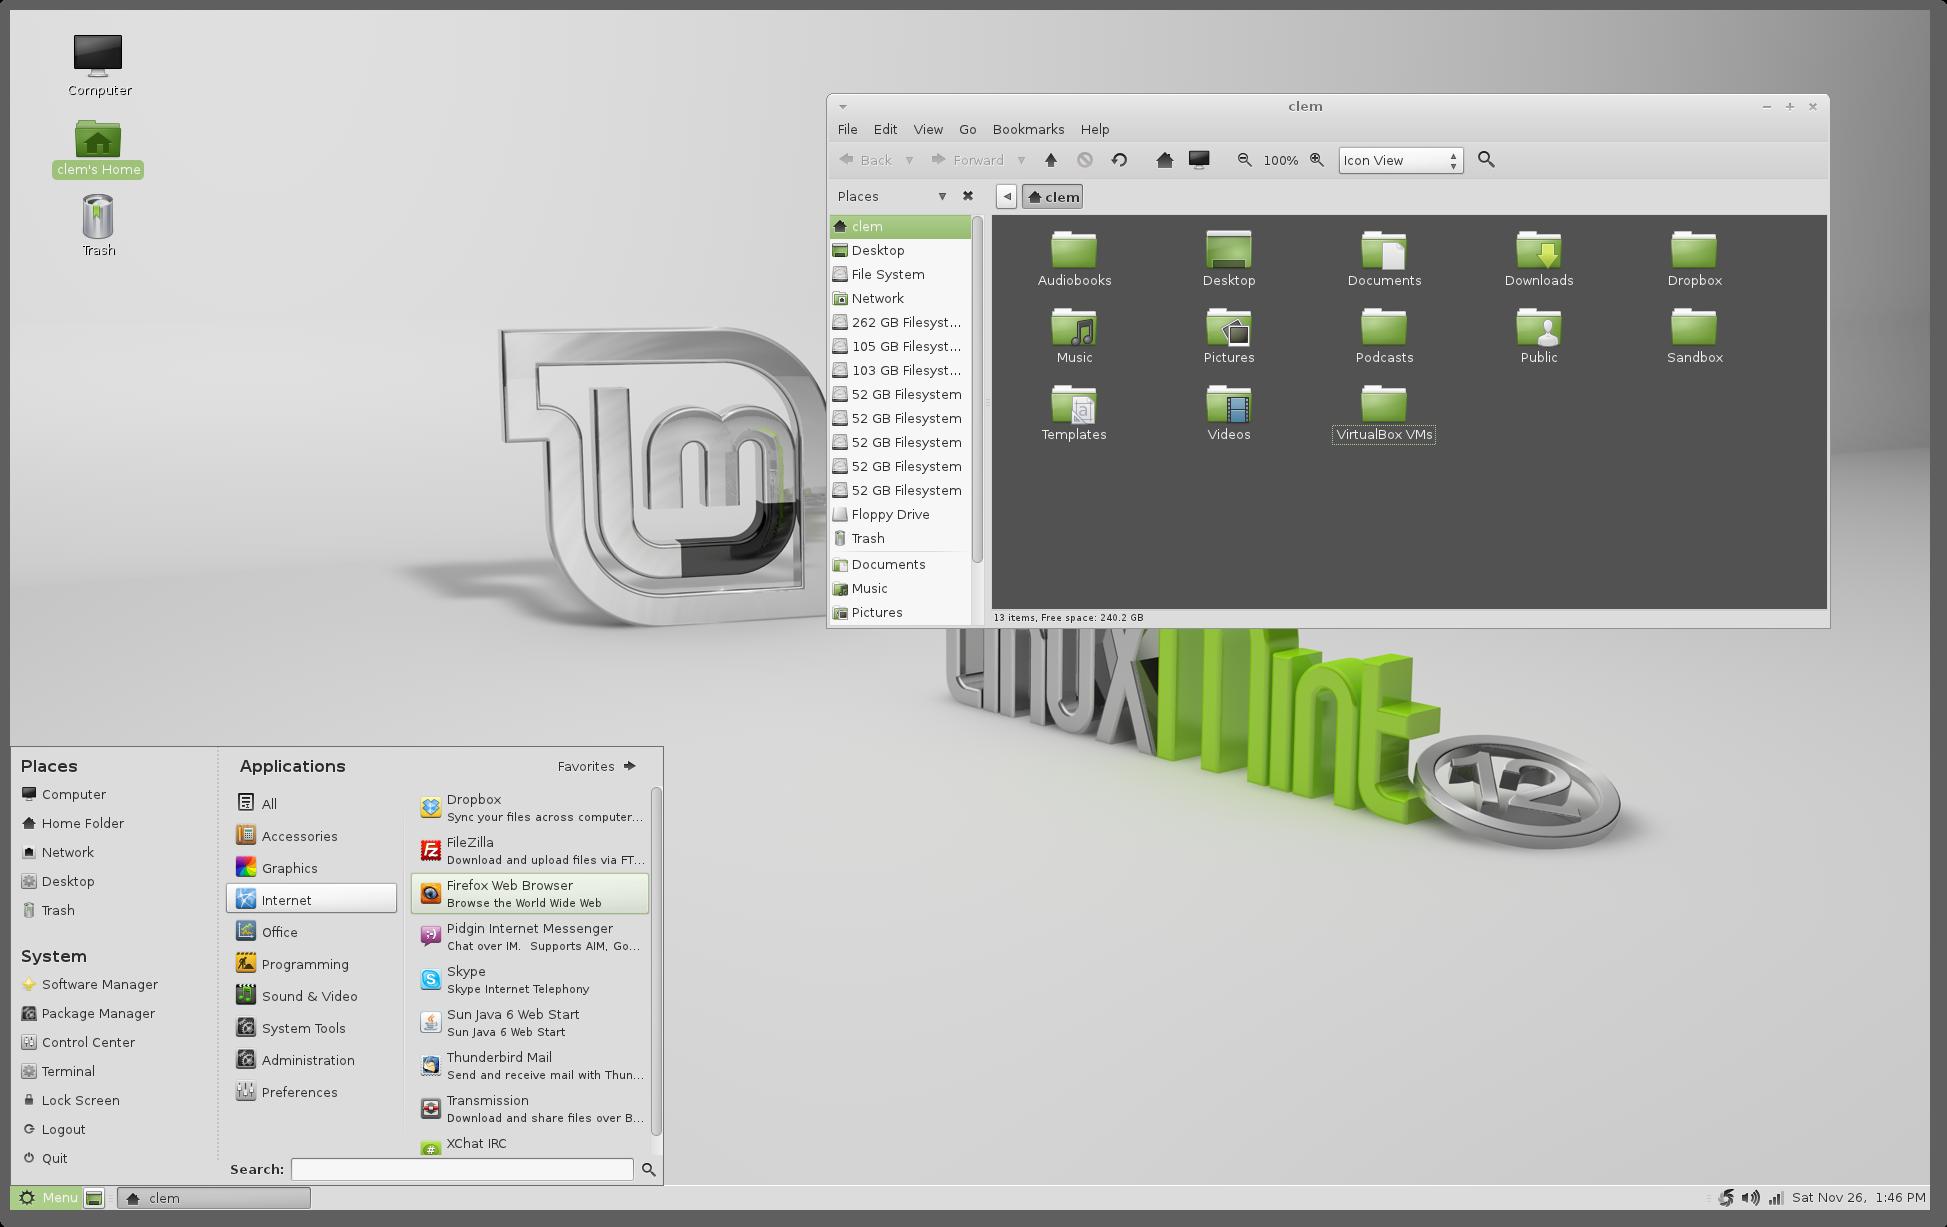 linux-mint-12-desktop-fotolia-ir-mate